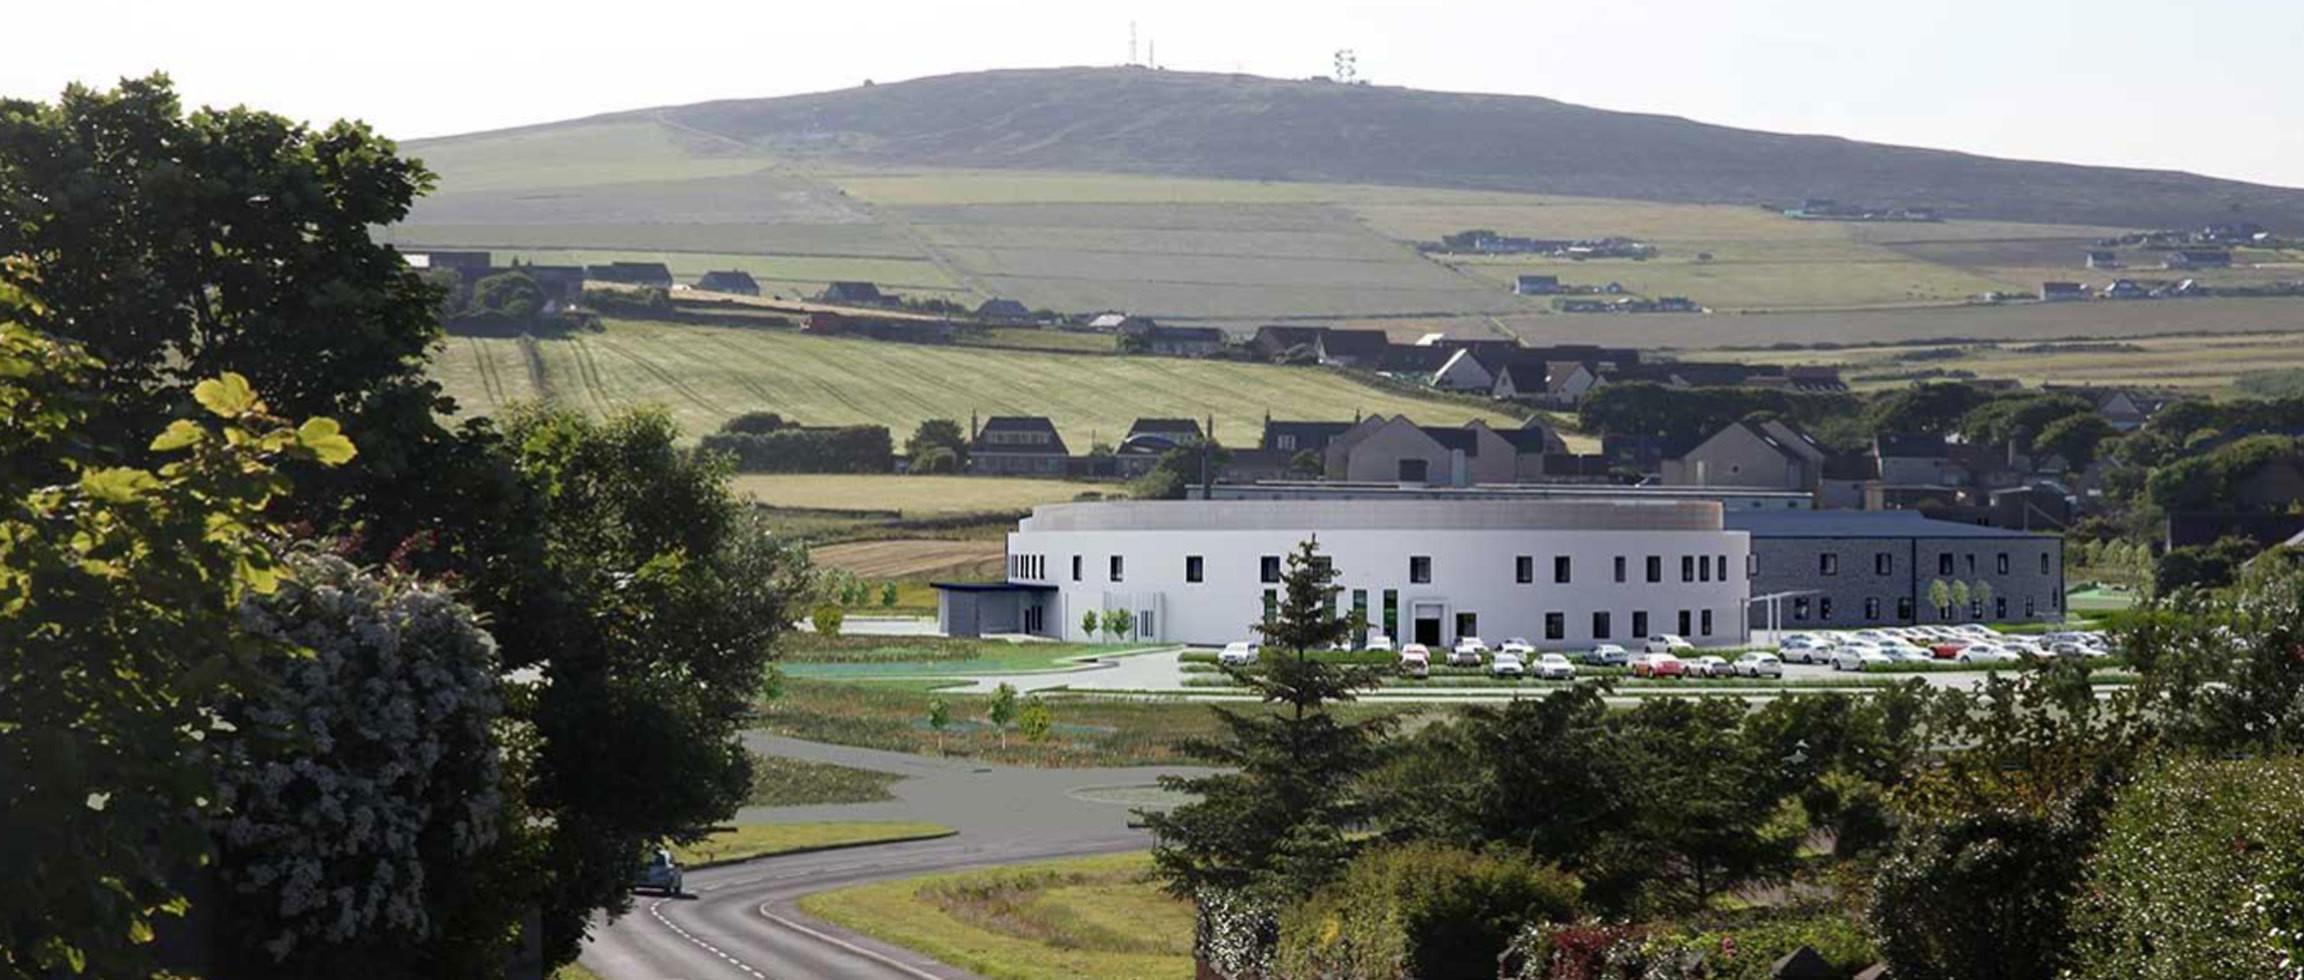 Orkney Hospital